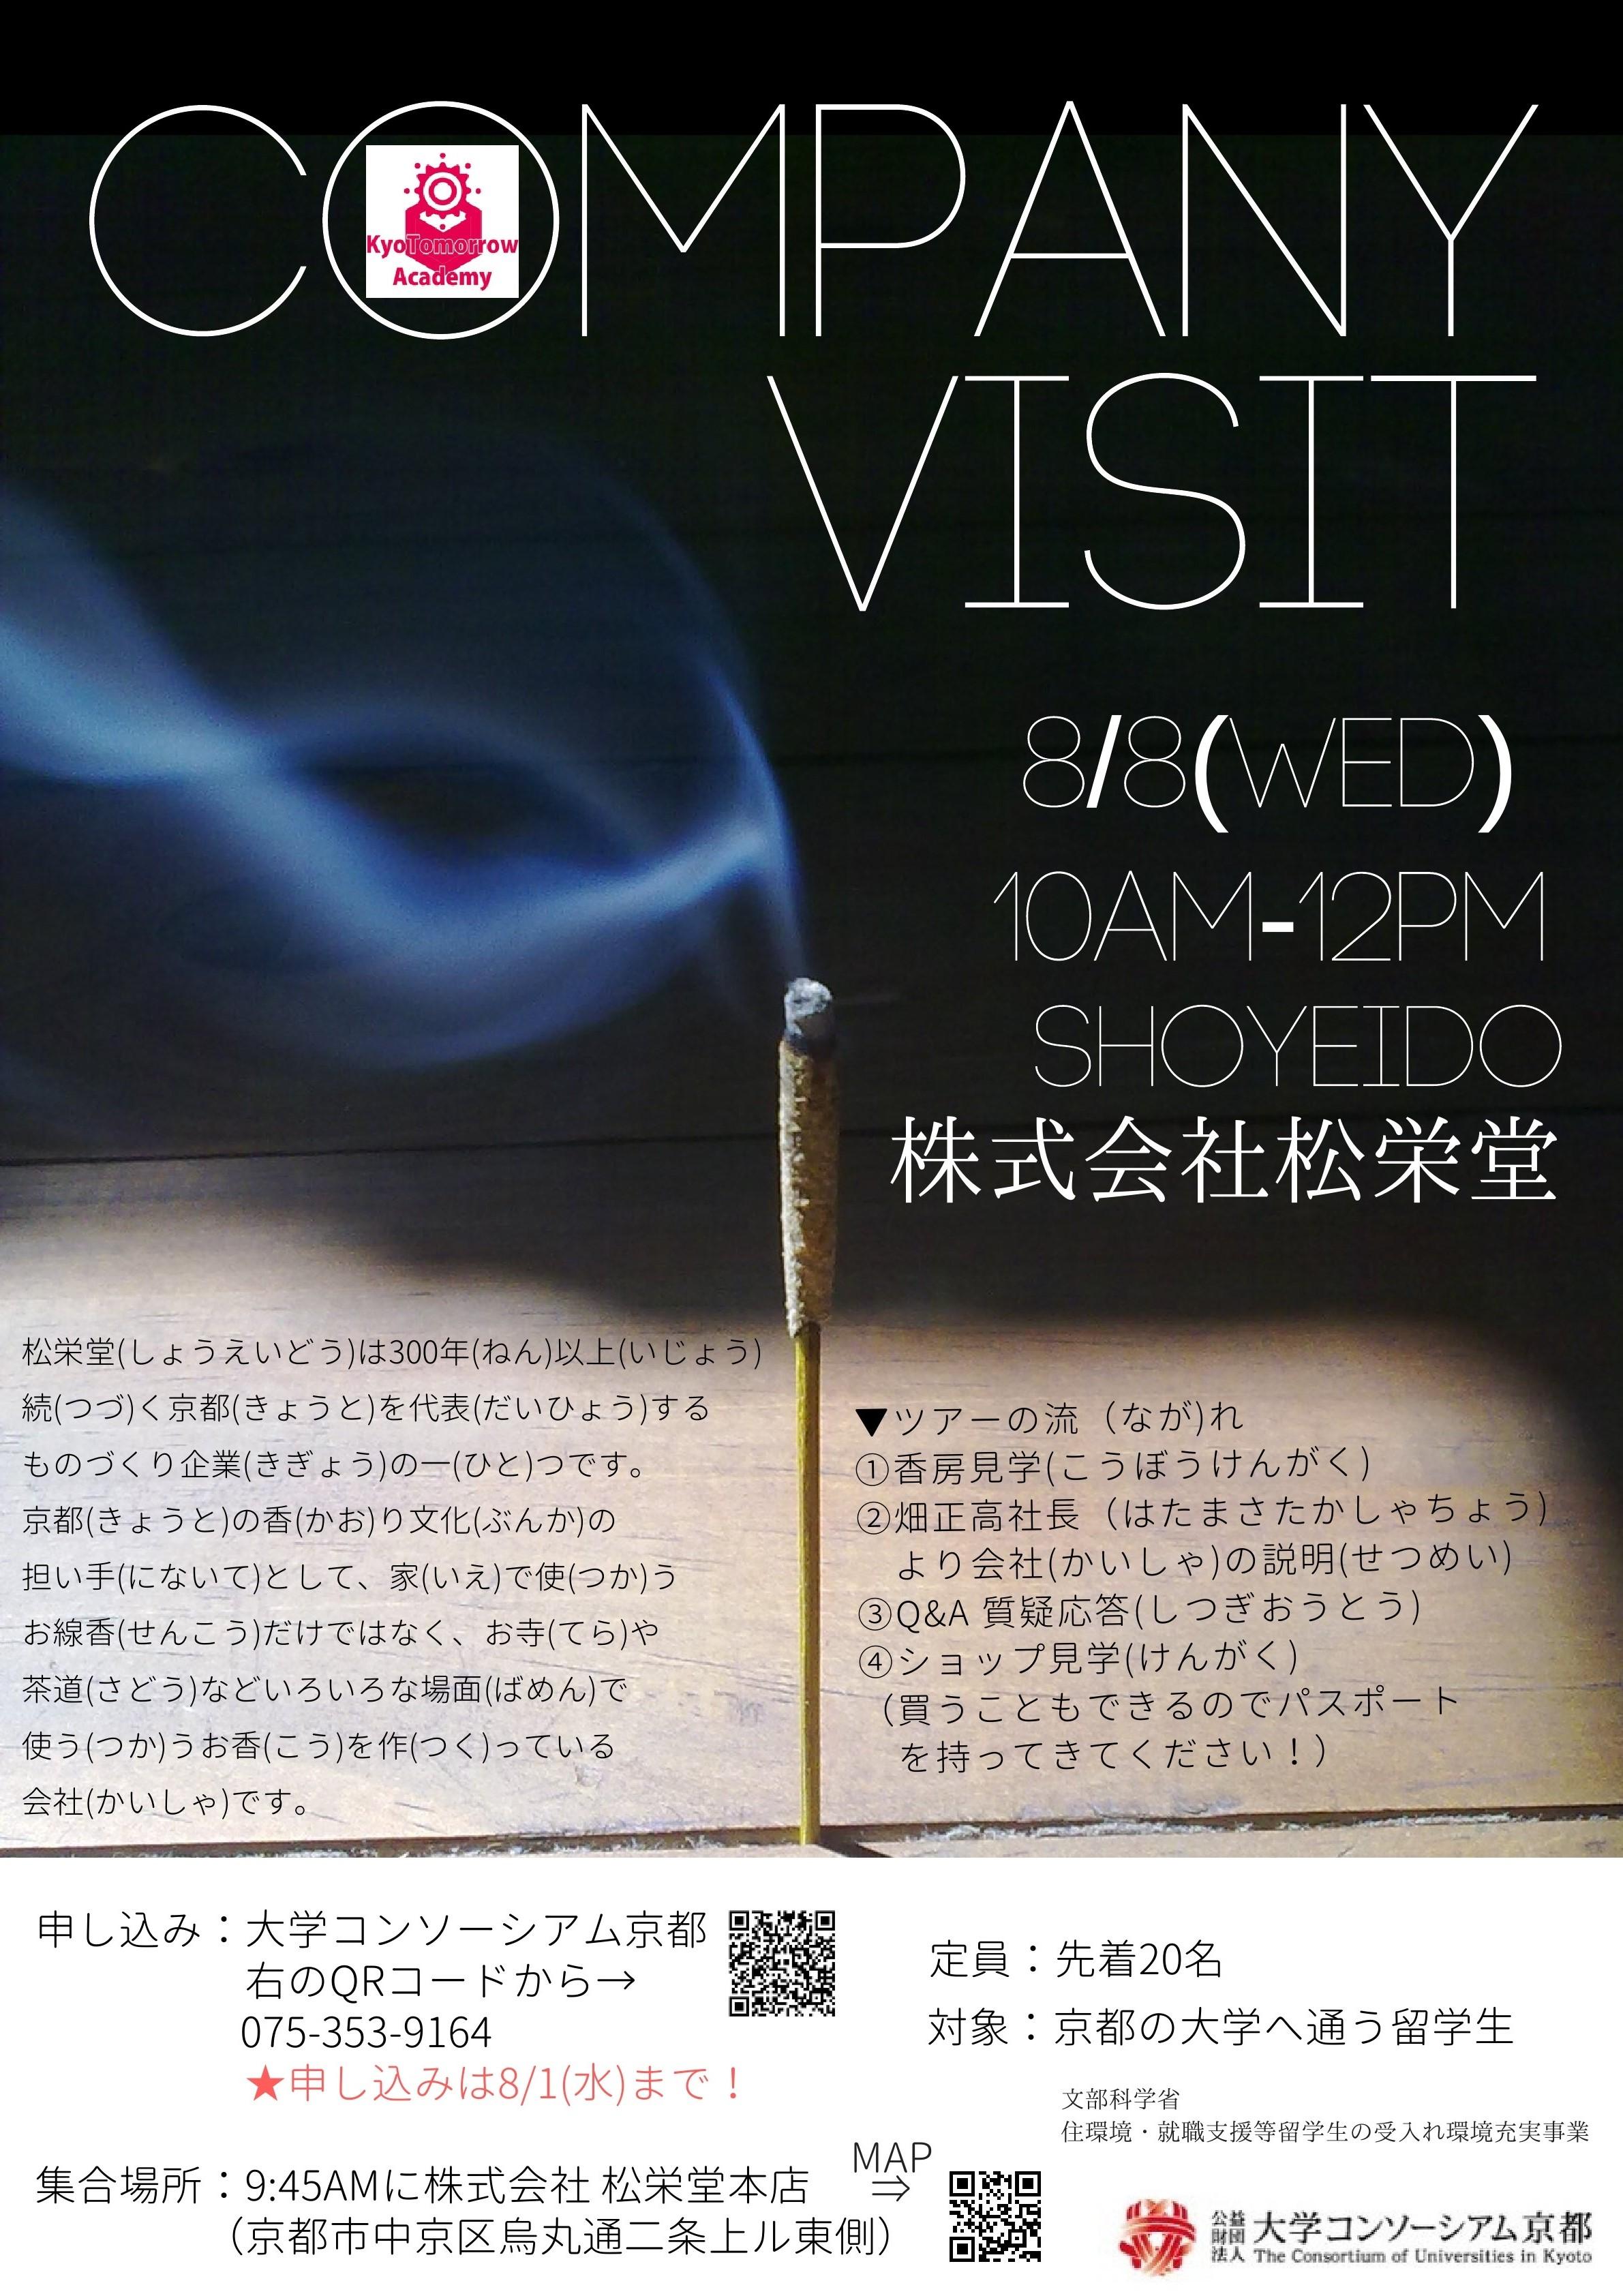 KTA Company visit_Shoyeido 180808